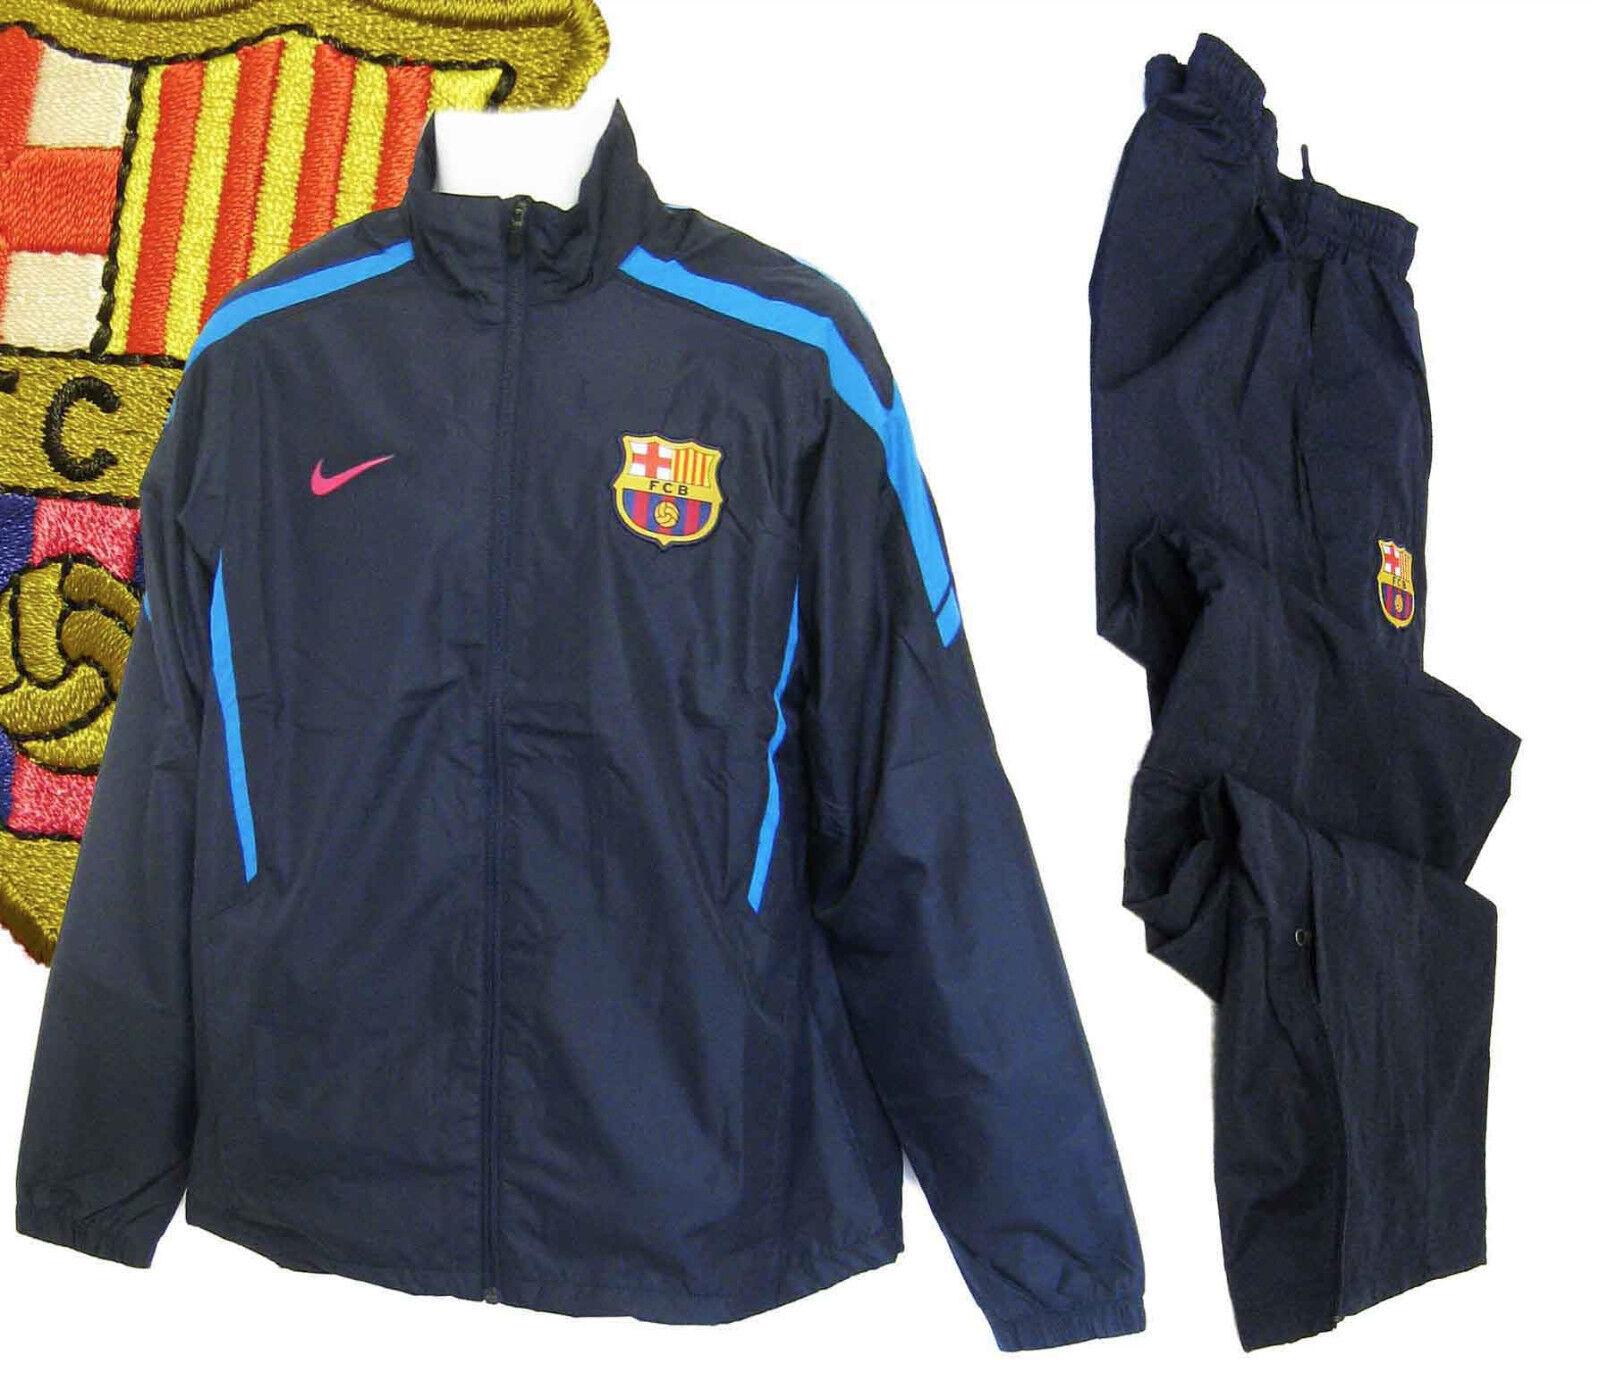 fd431468d5623f Neu Nike Herren Barcelona Fußballverein Trainingsanzug Marineblau Klein